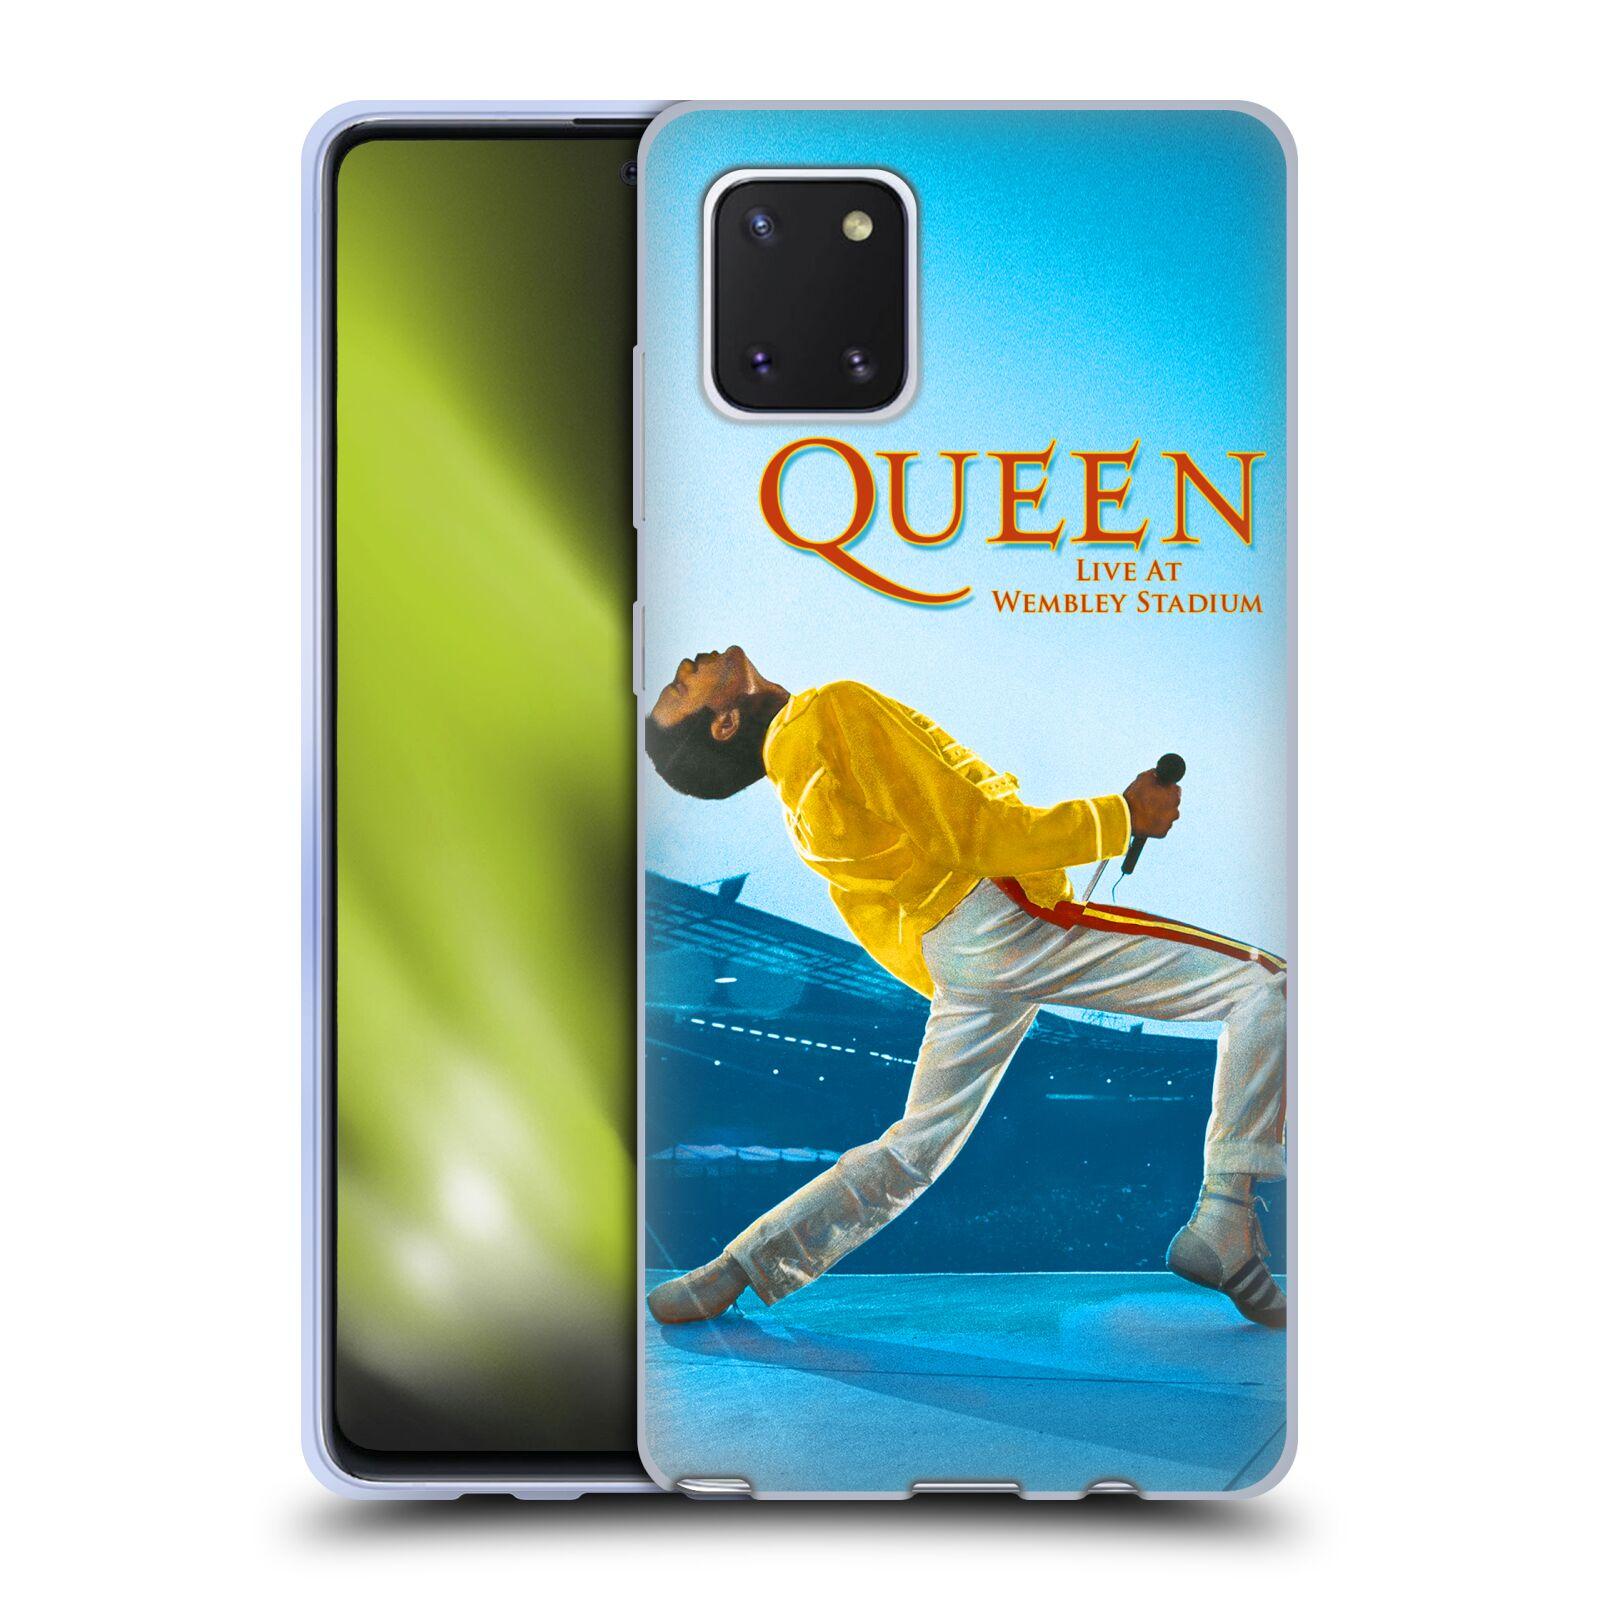 Silikonové pouzdro na mobil Samsung Galaxy Note 10 Lite - Head Case - Queen - Freddie Mercury